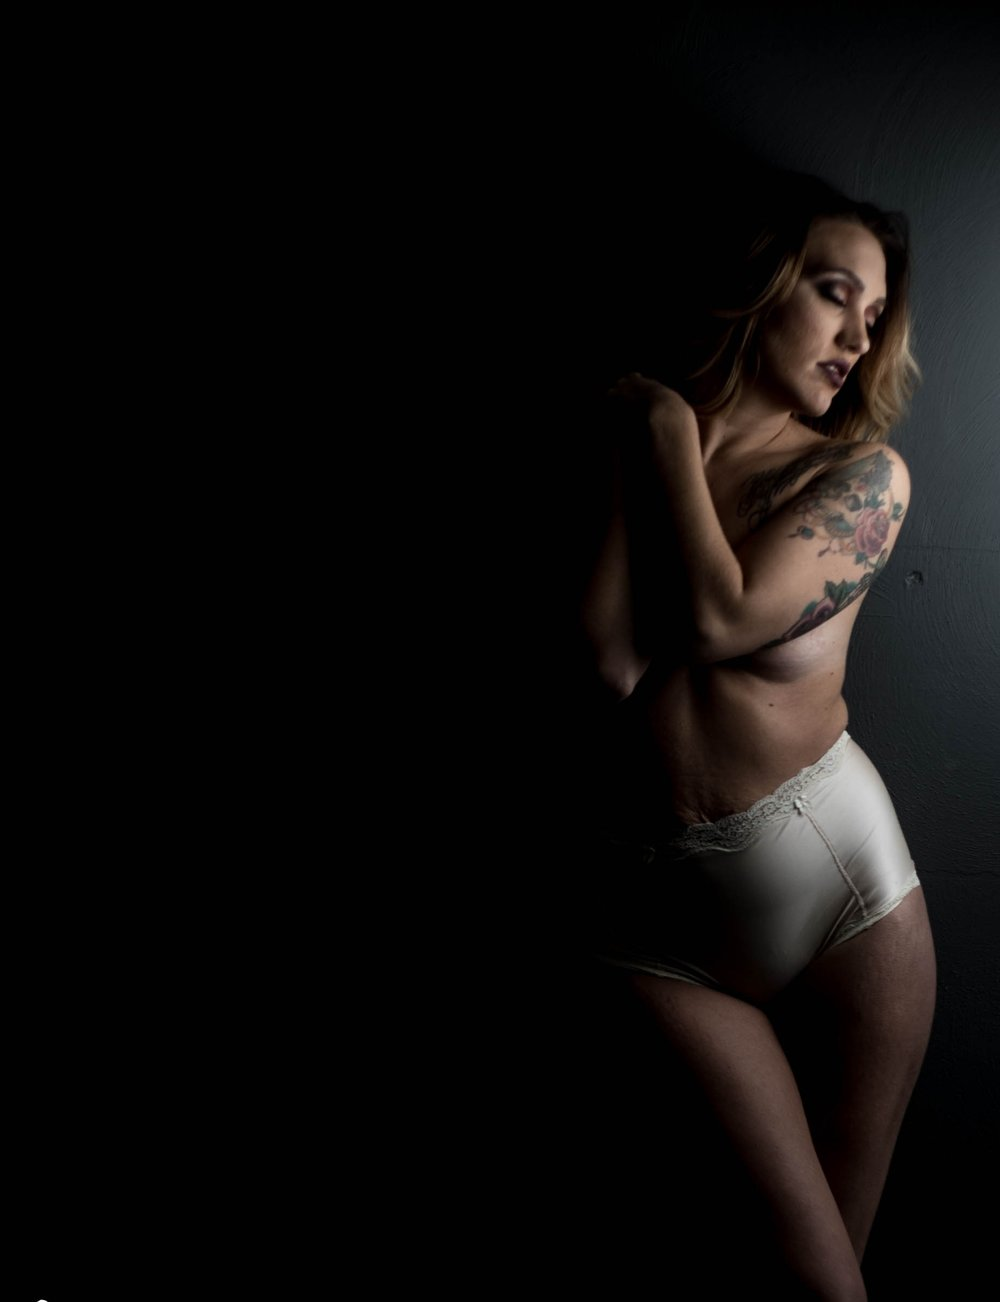 Edenton Boone Asheville WNC luxury premiere boudoir photography studio